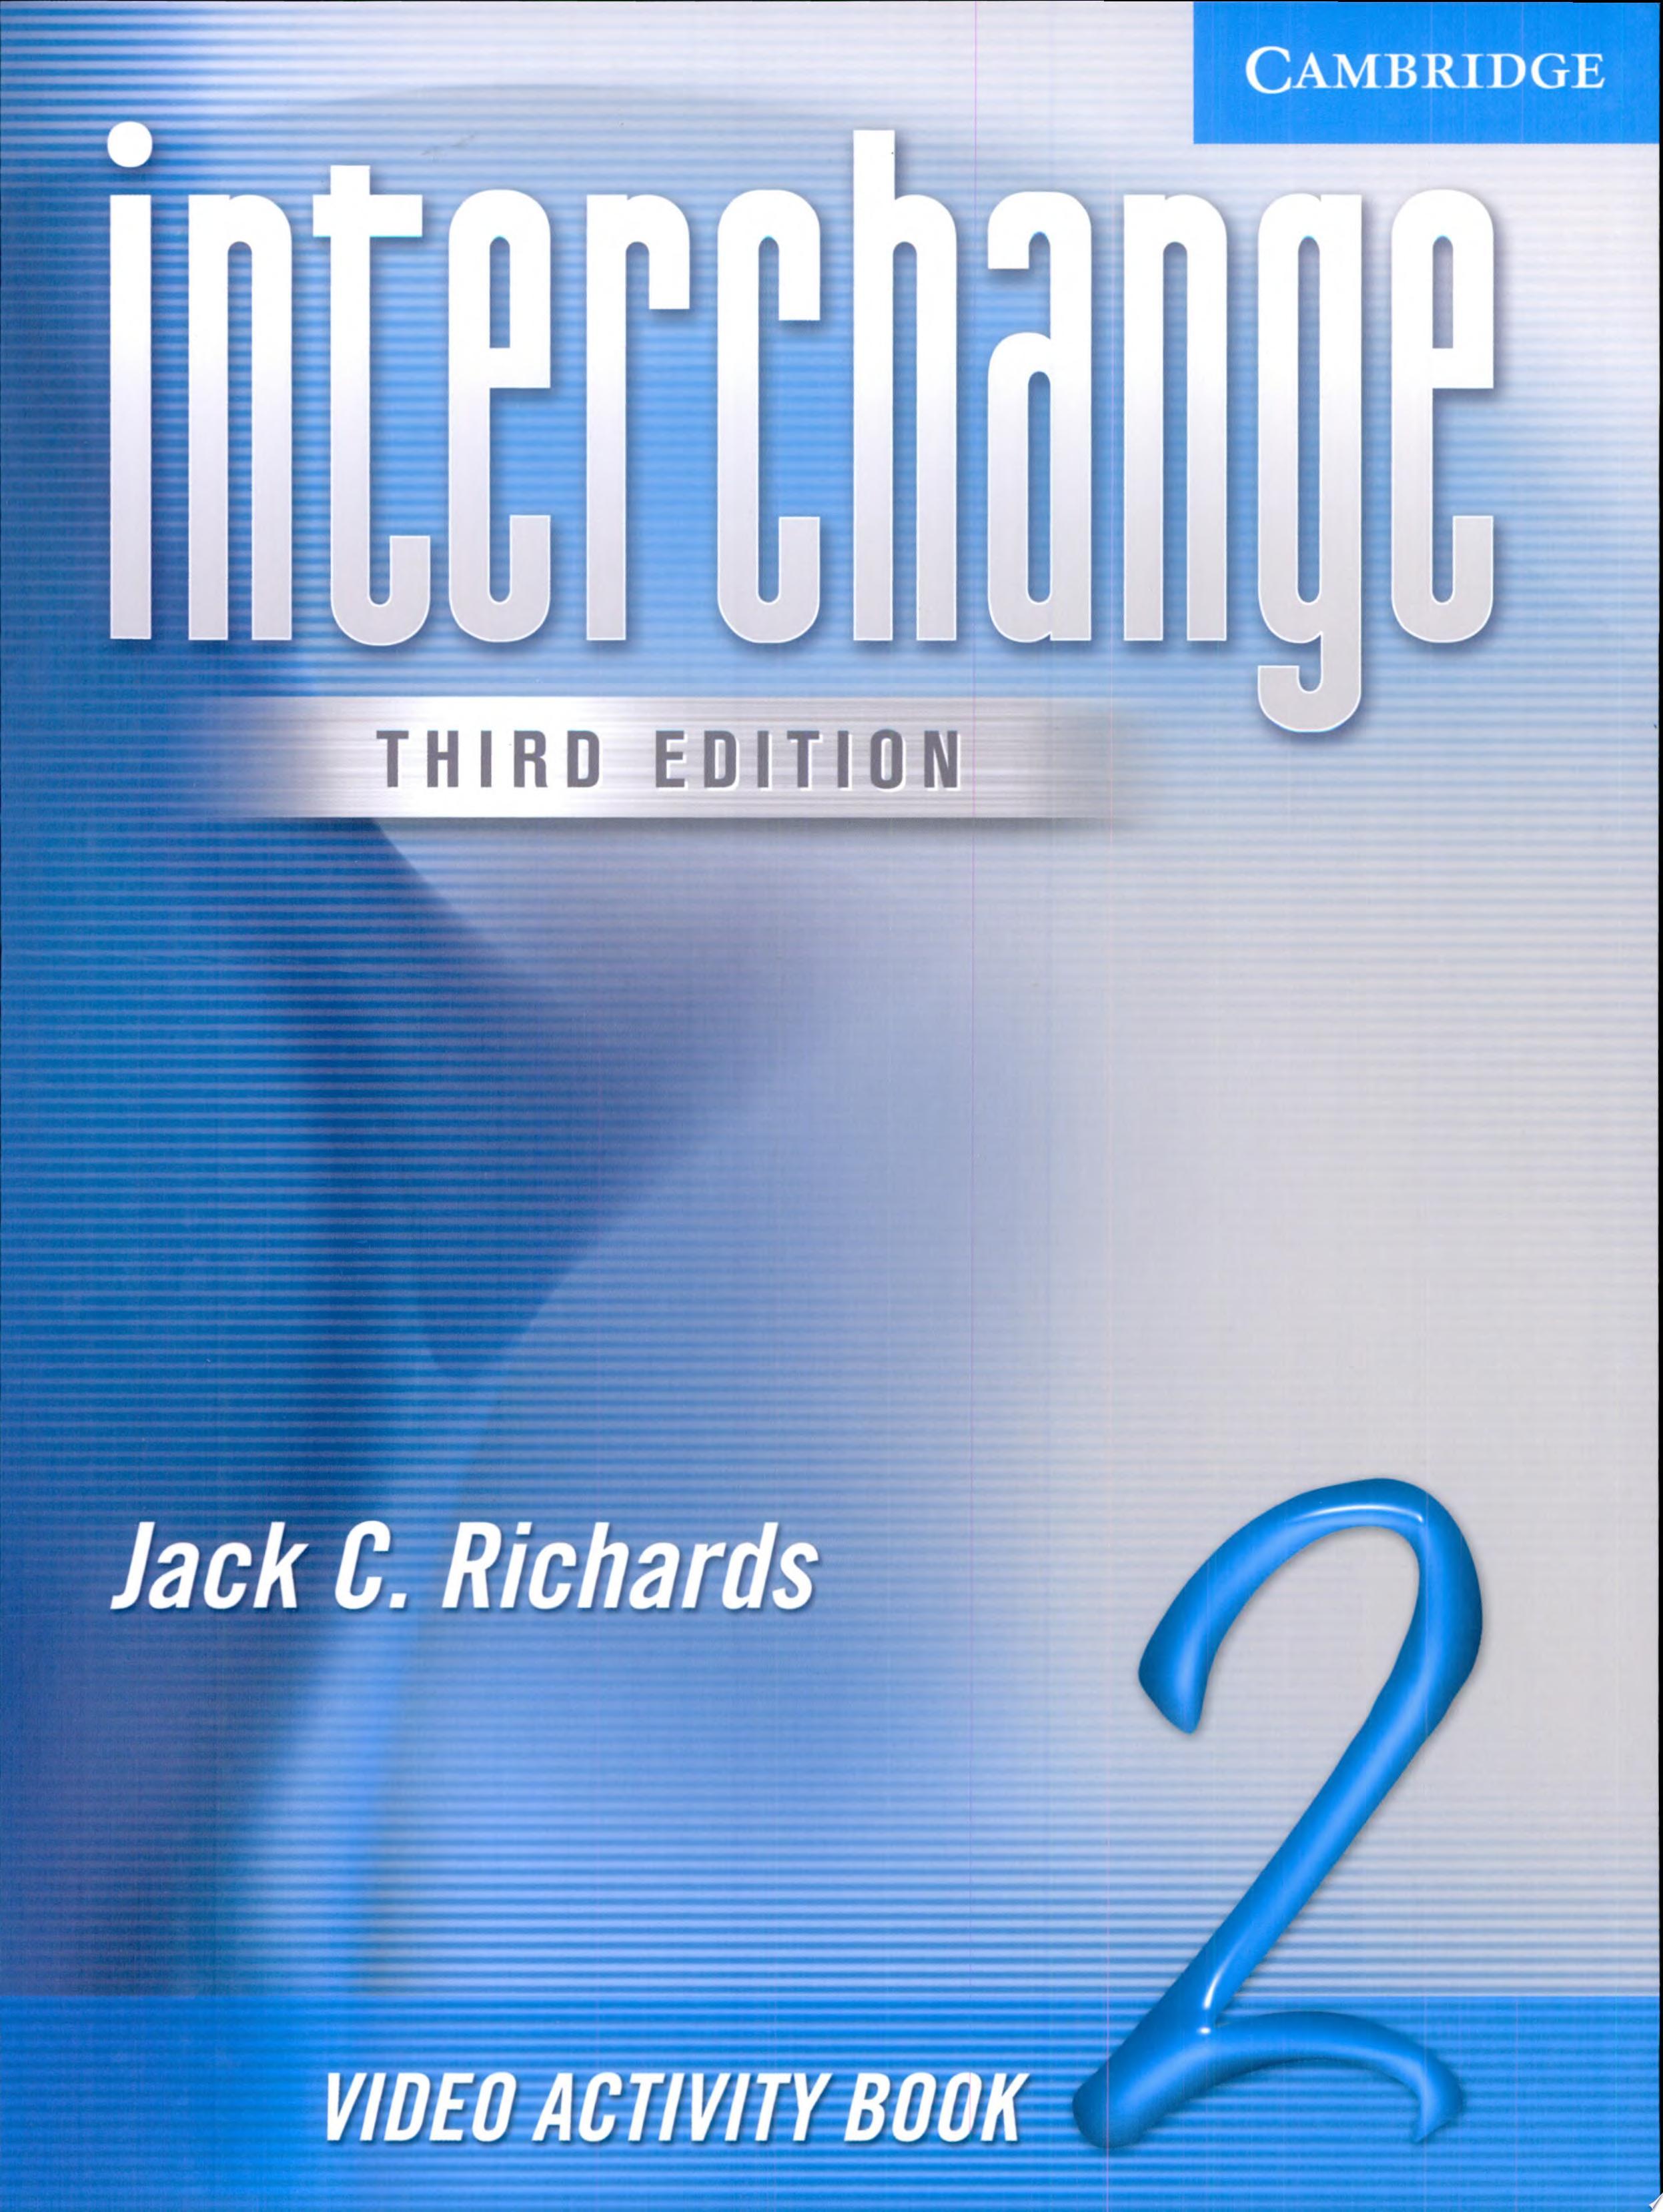 Interchange Video Activity